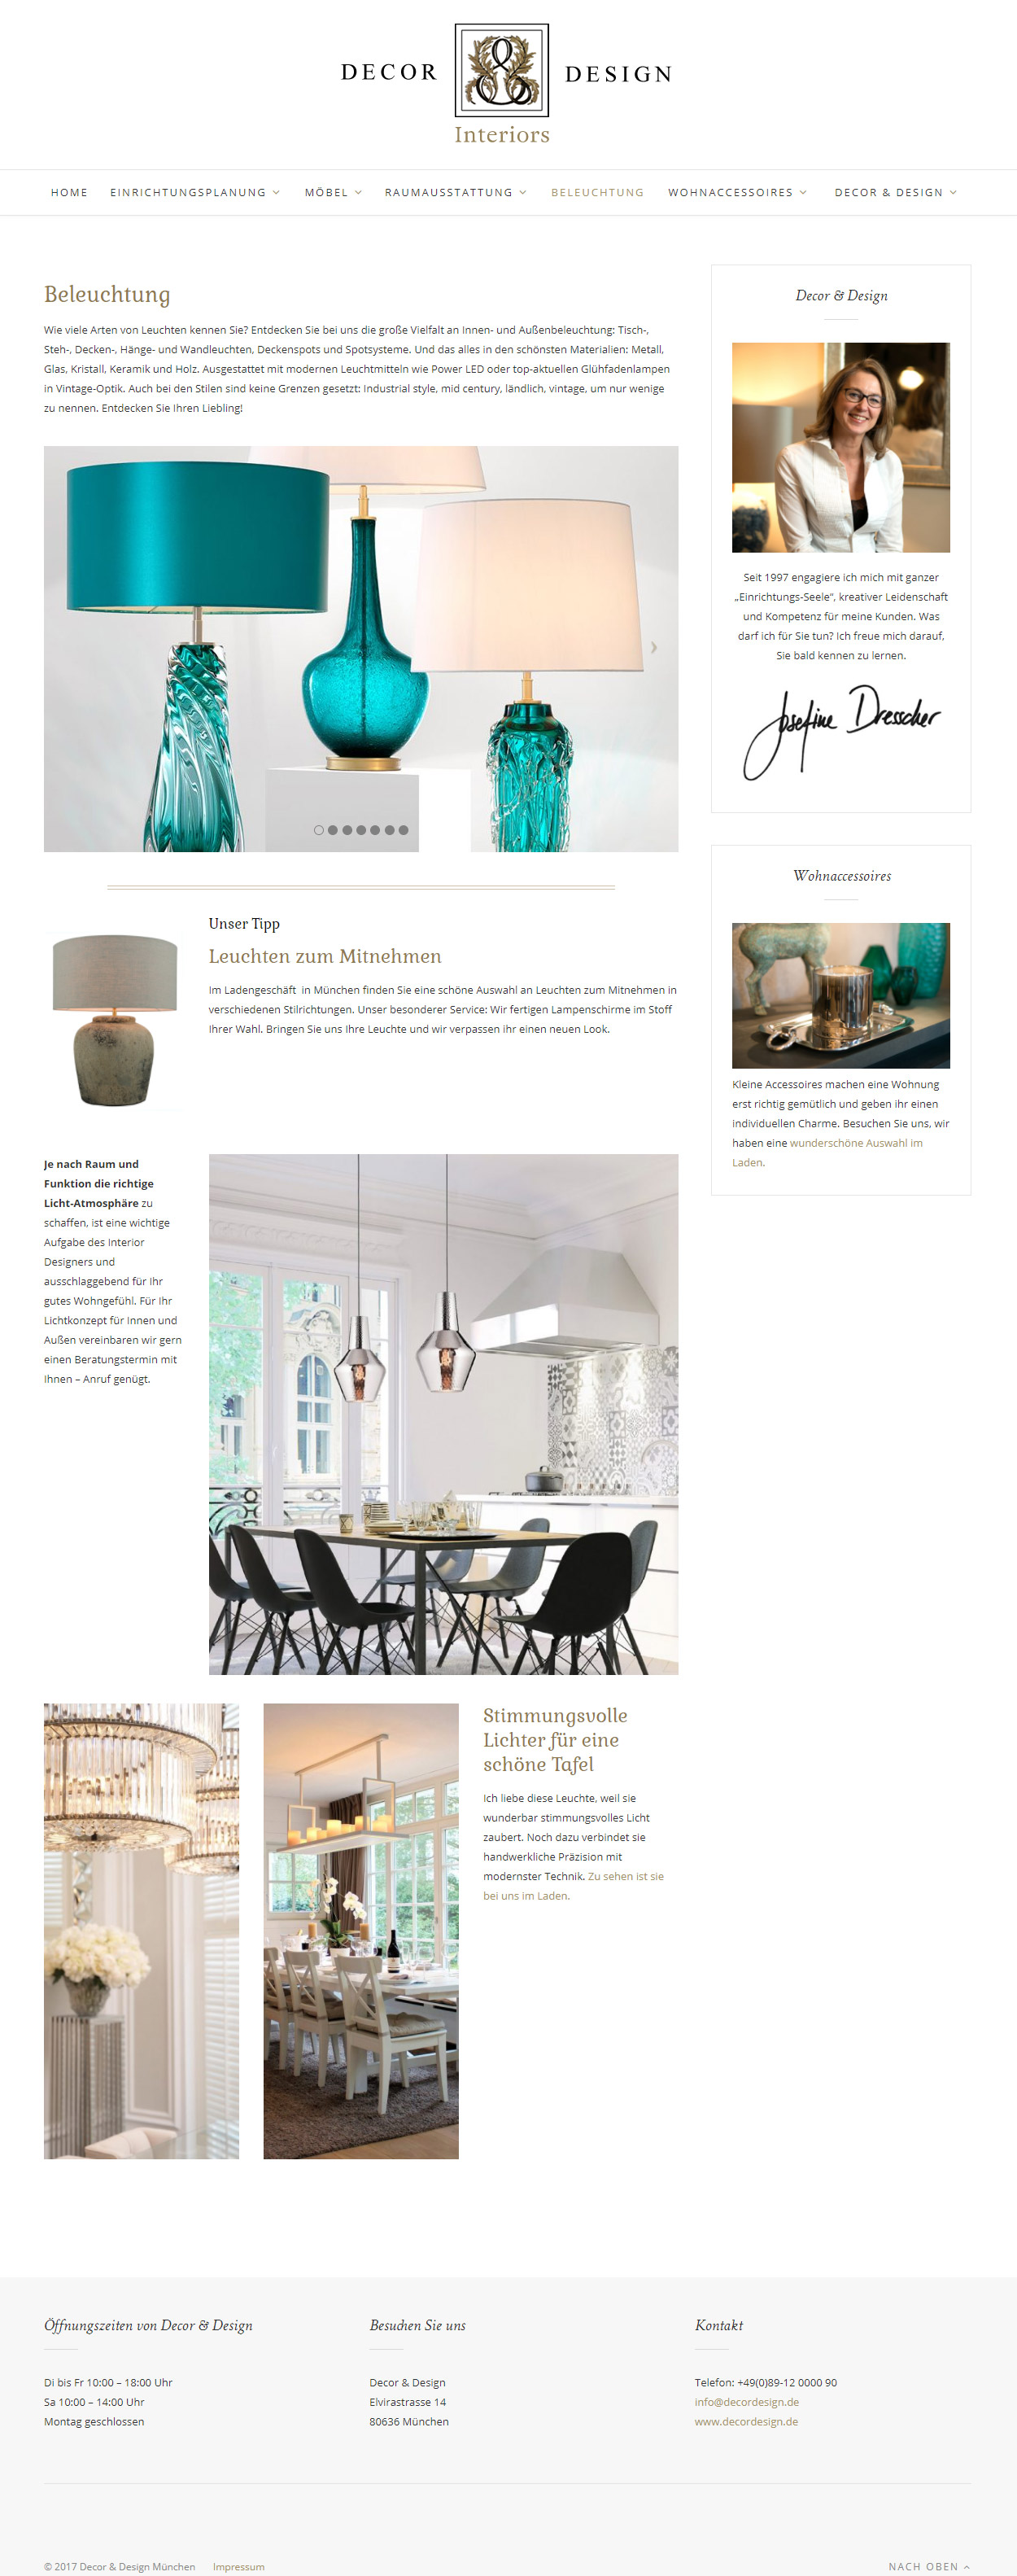 Tina Thanner Decor & Design Relaunch